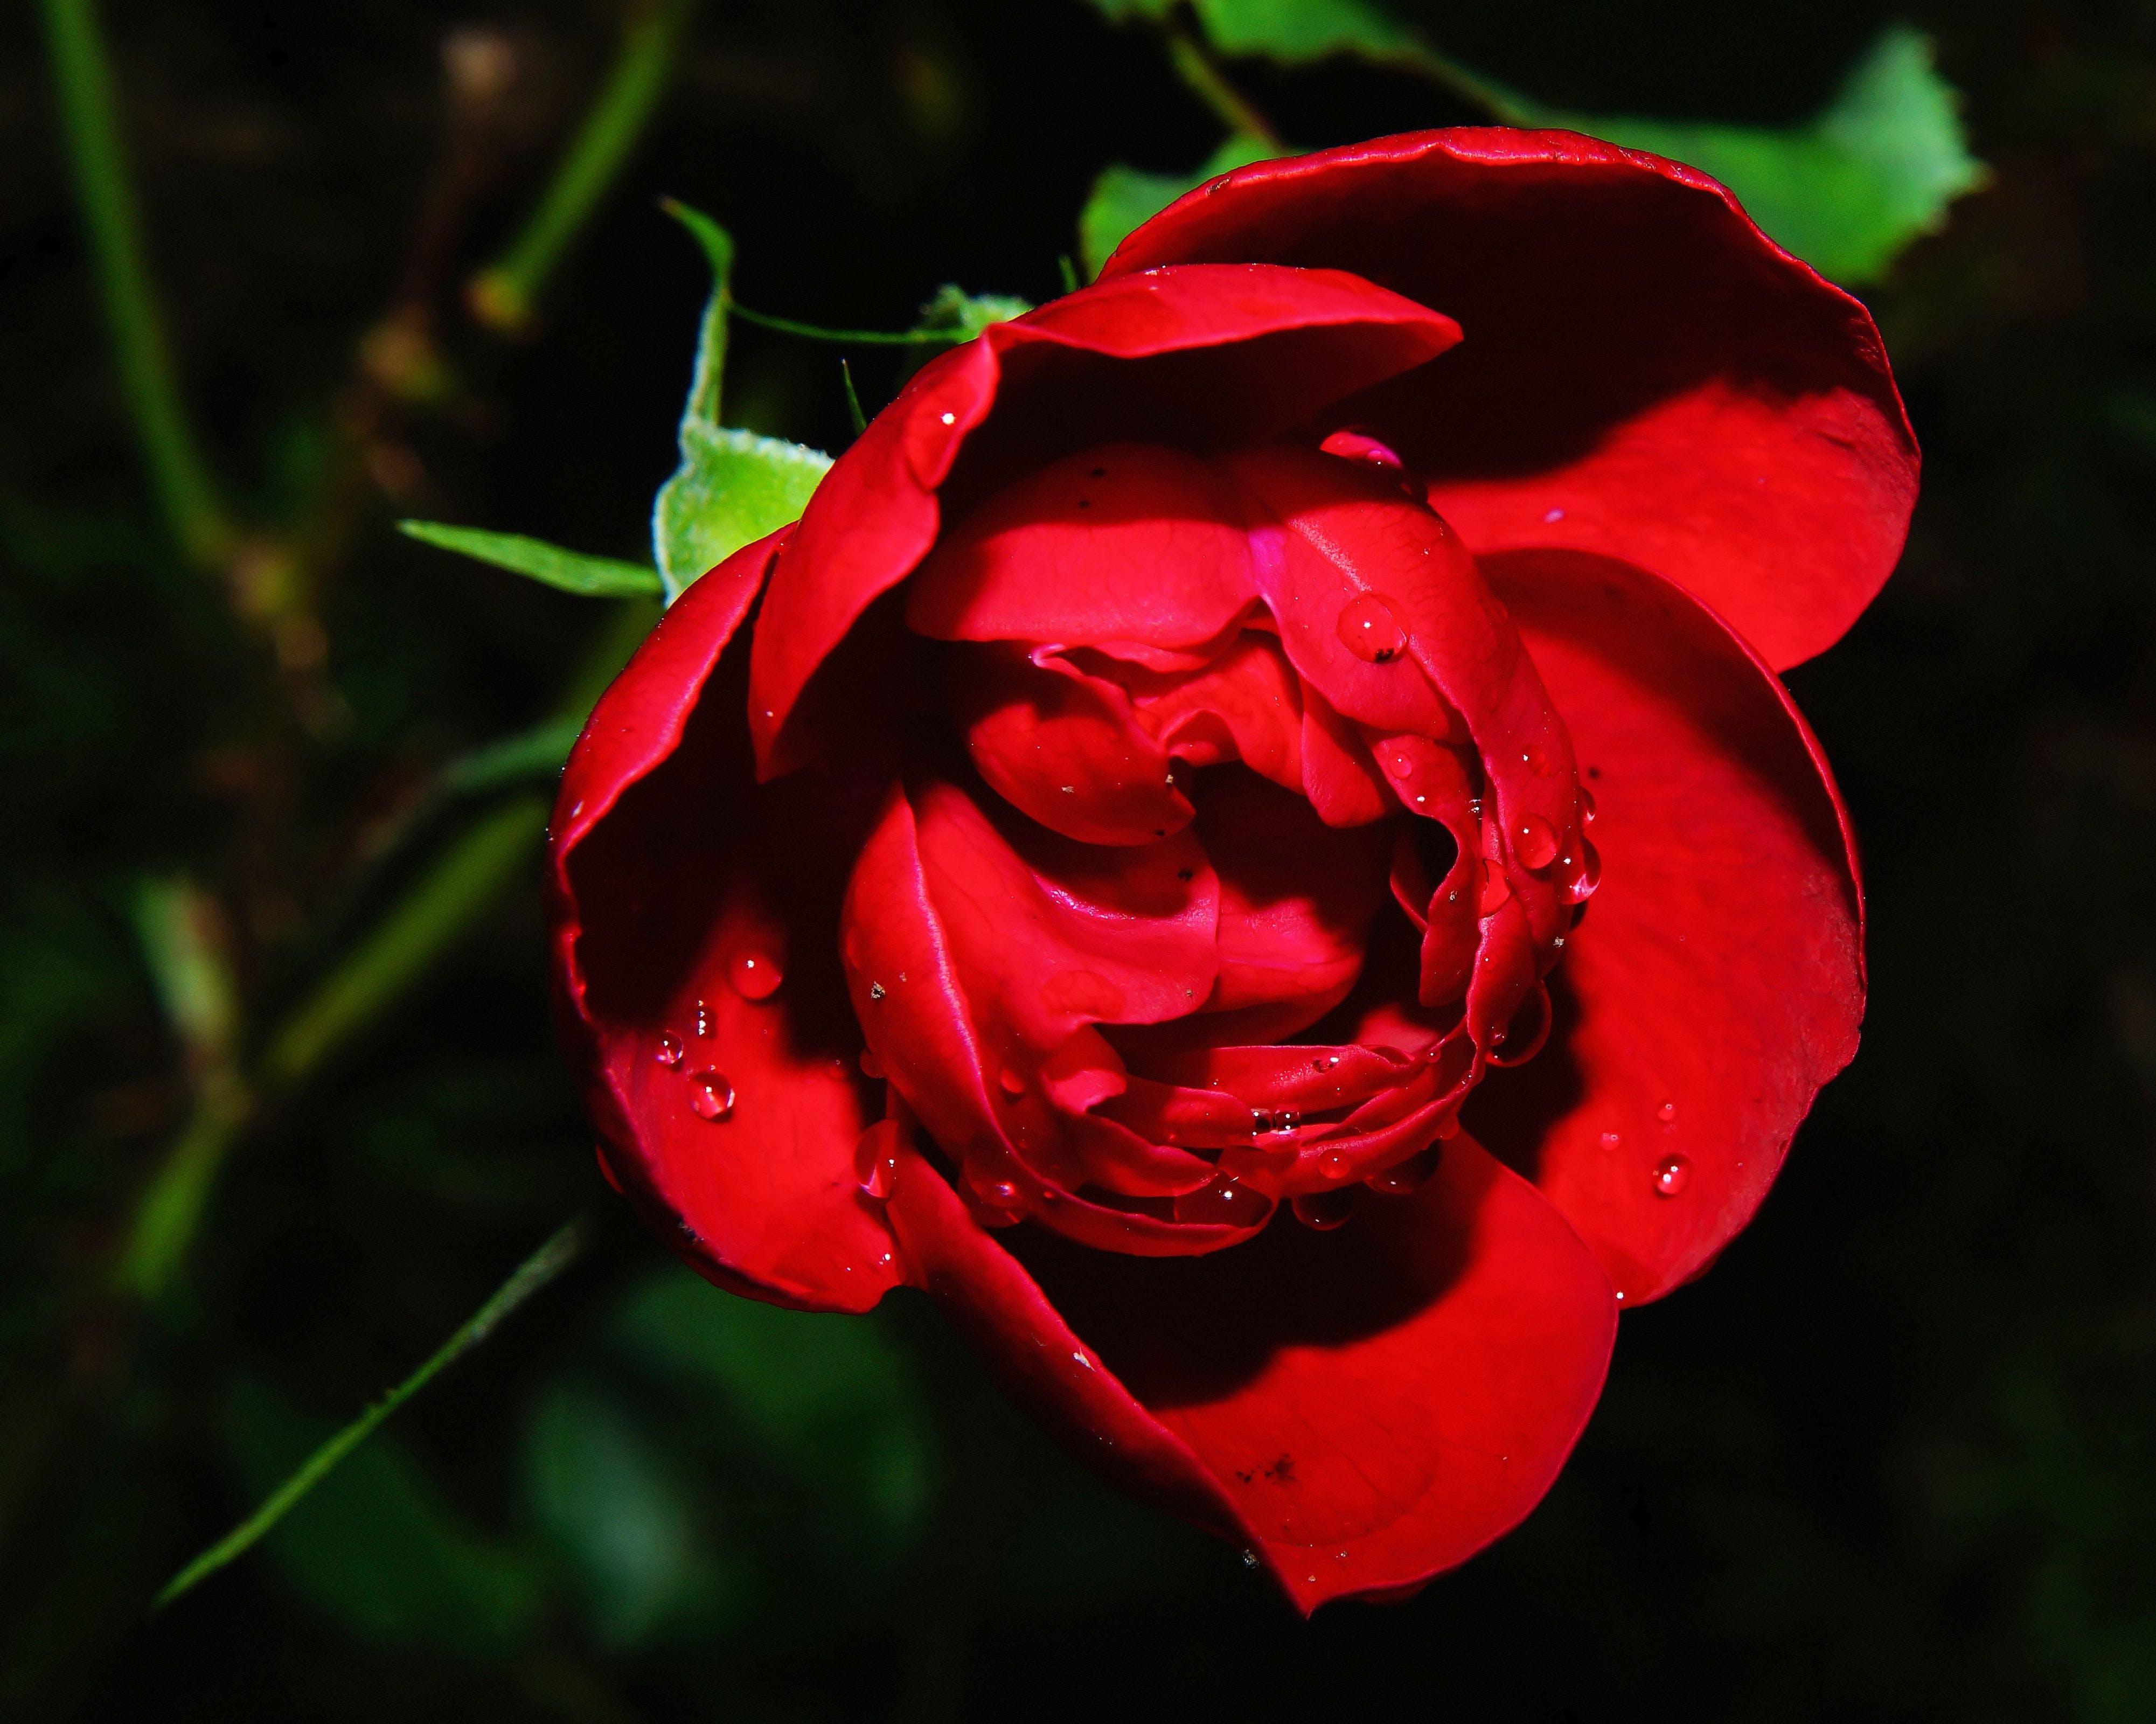 Kostenloses Stock Foto zu natur, rot, blütenblätter, pflanze